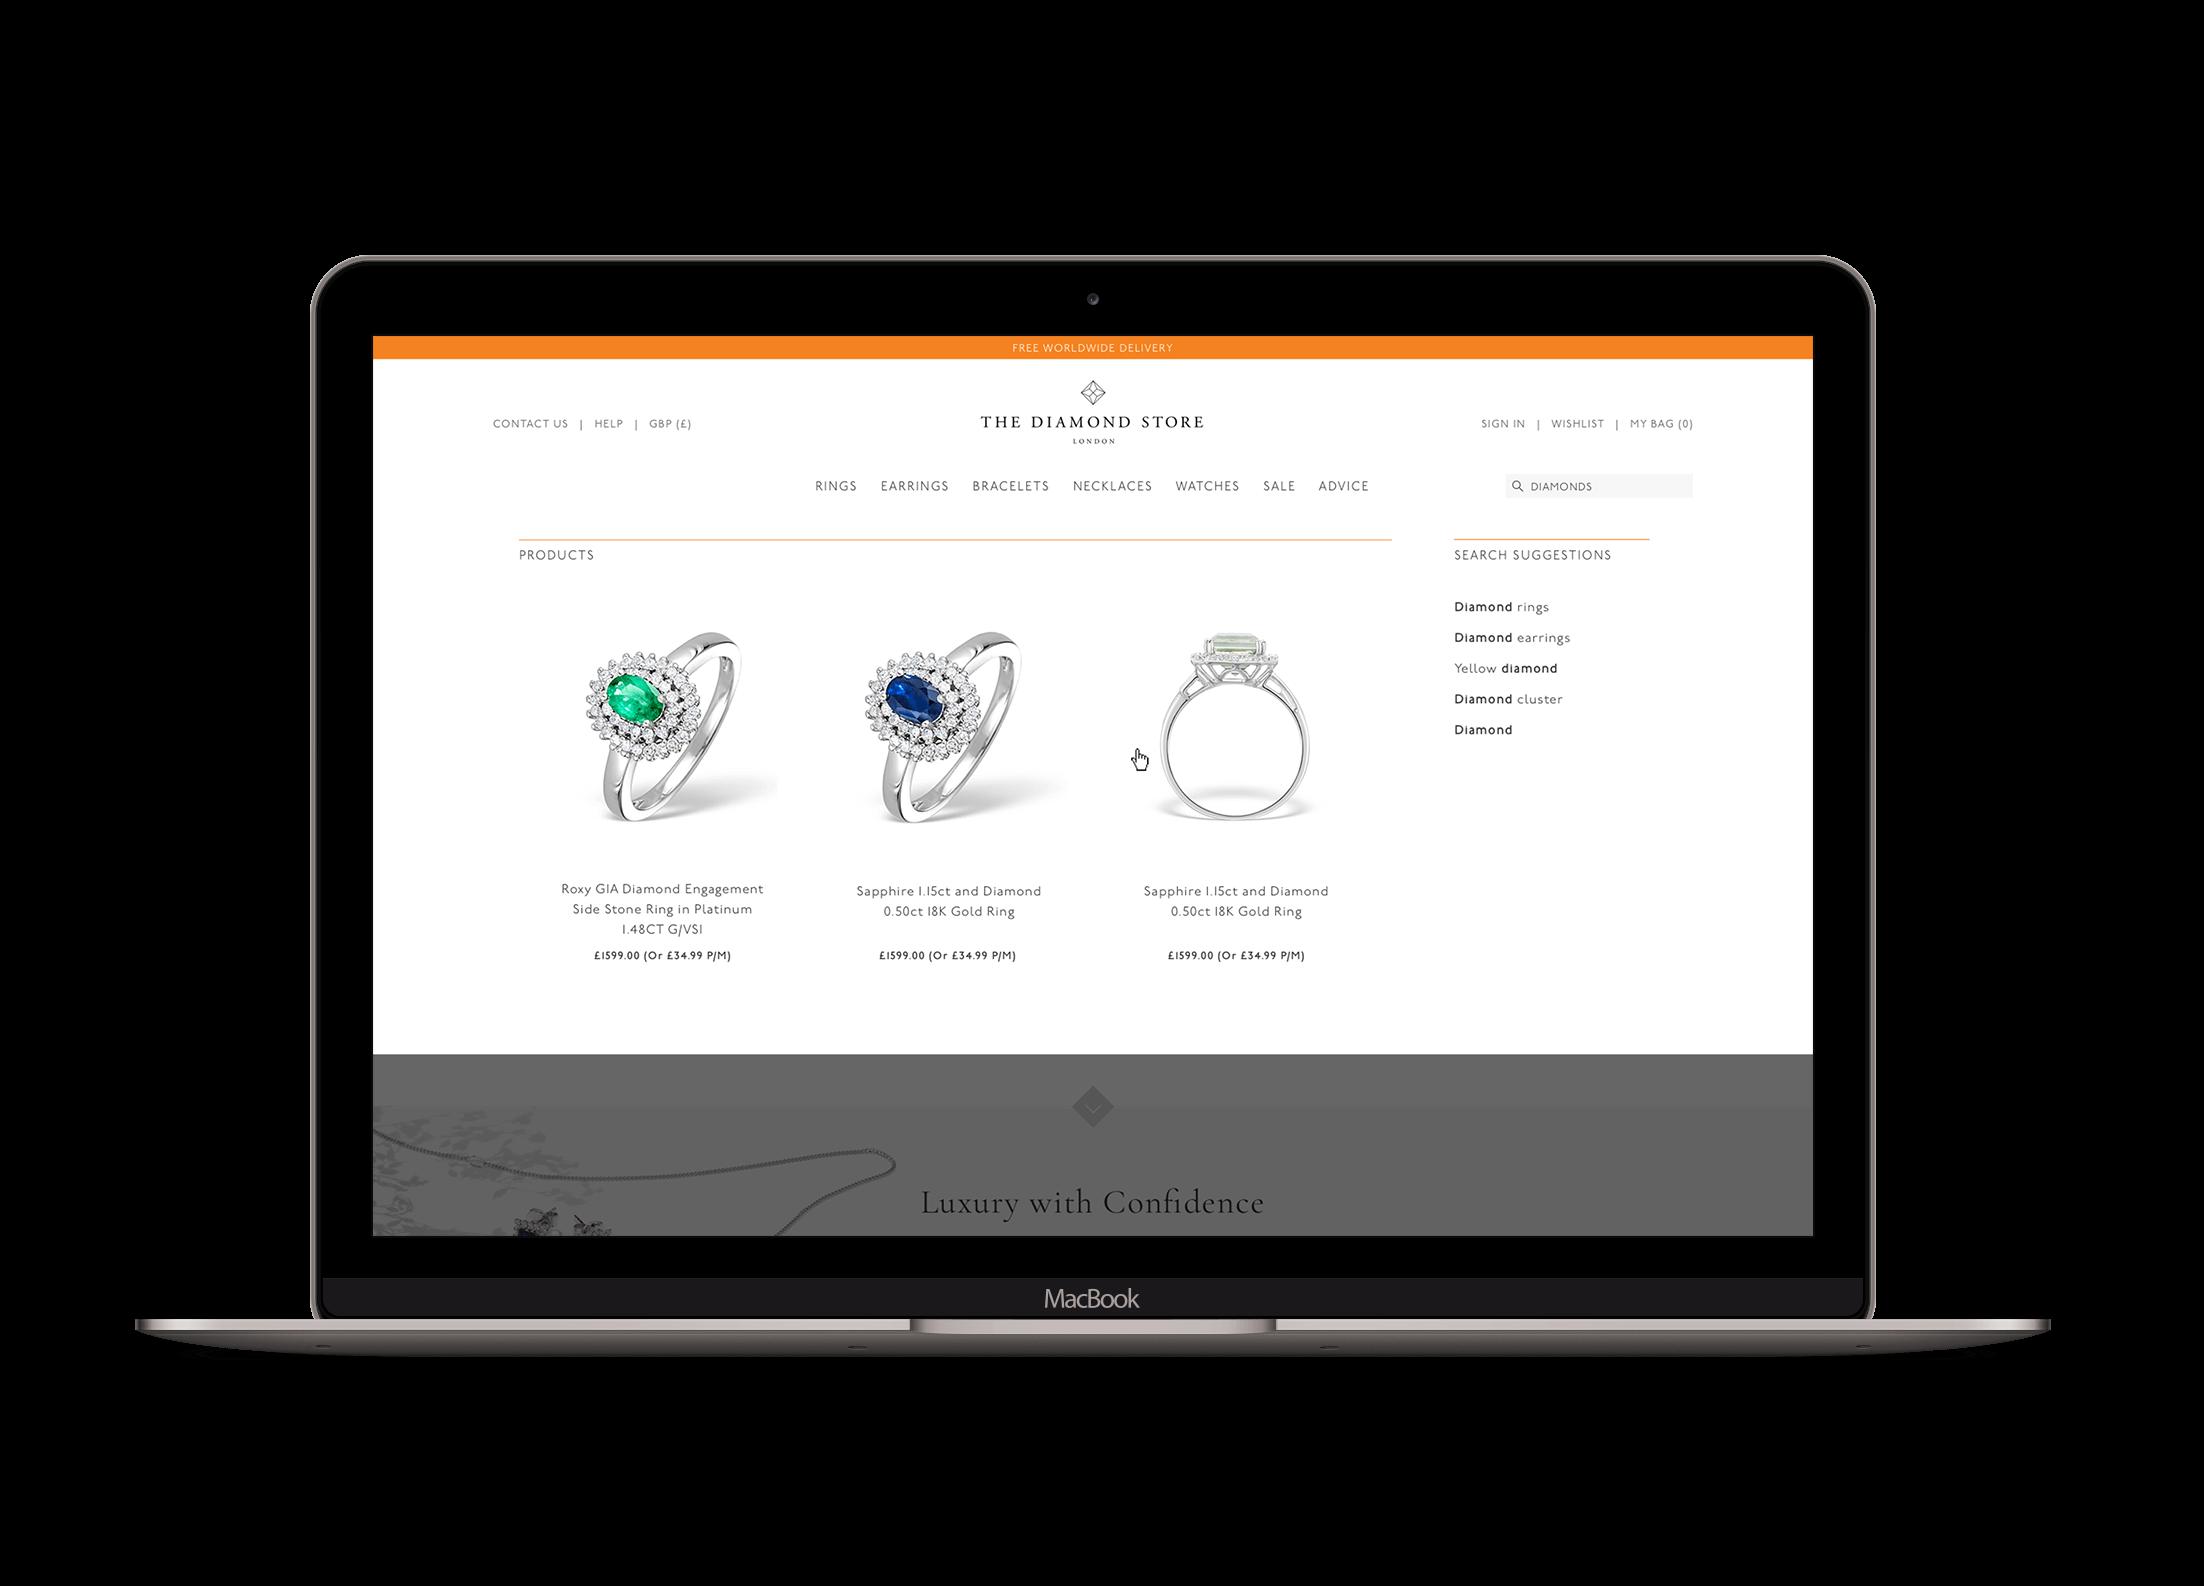 Chânelle-Sharp-Digital-Portfolio-The-Diamond-Store-Macbook-13